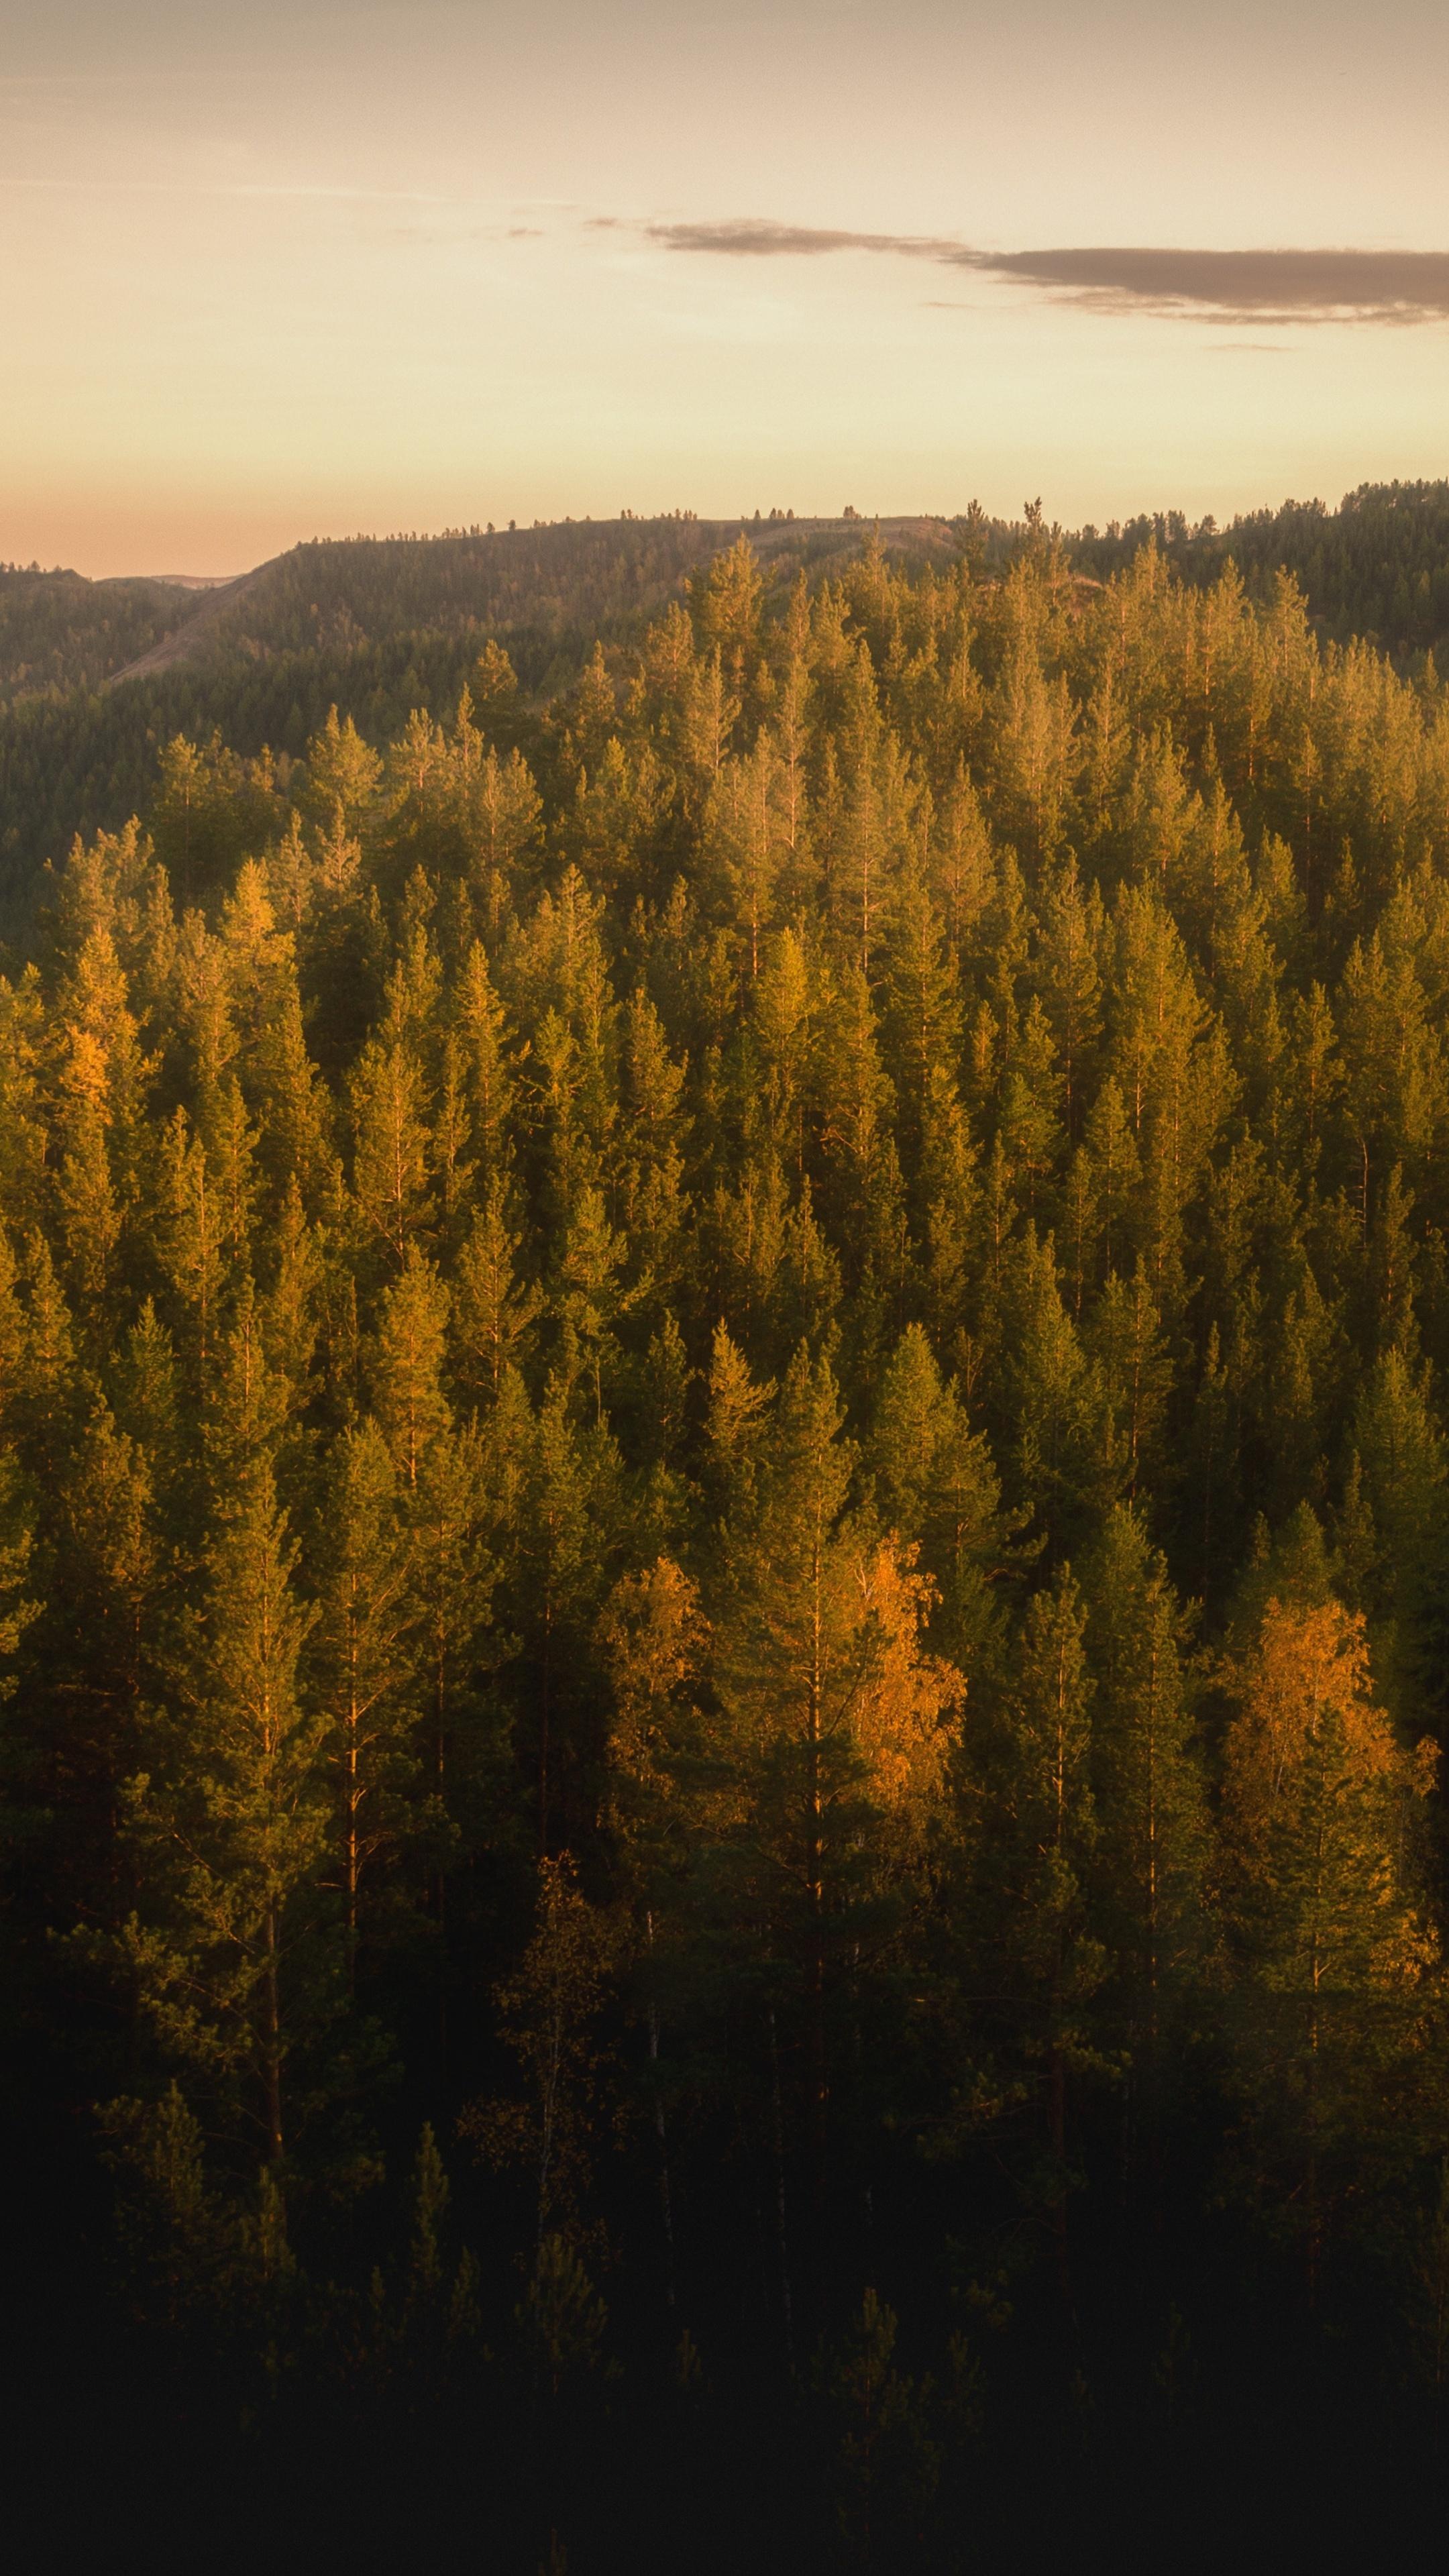 autumn-forests-of-the-nurali-hills-5k-bp.jpg